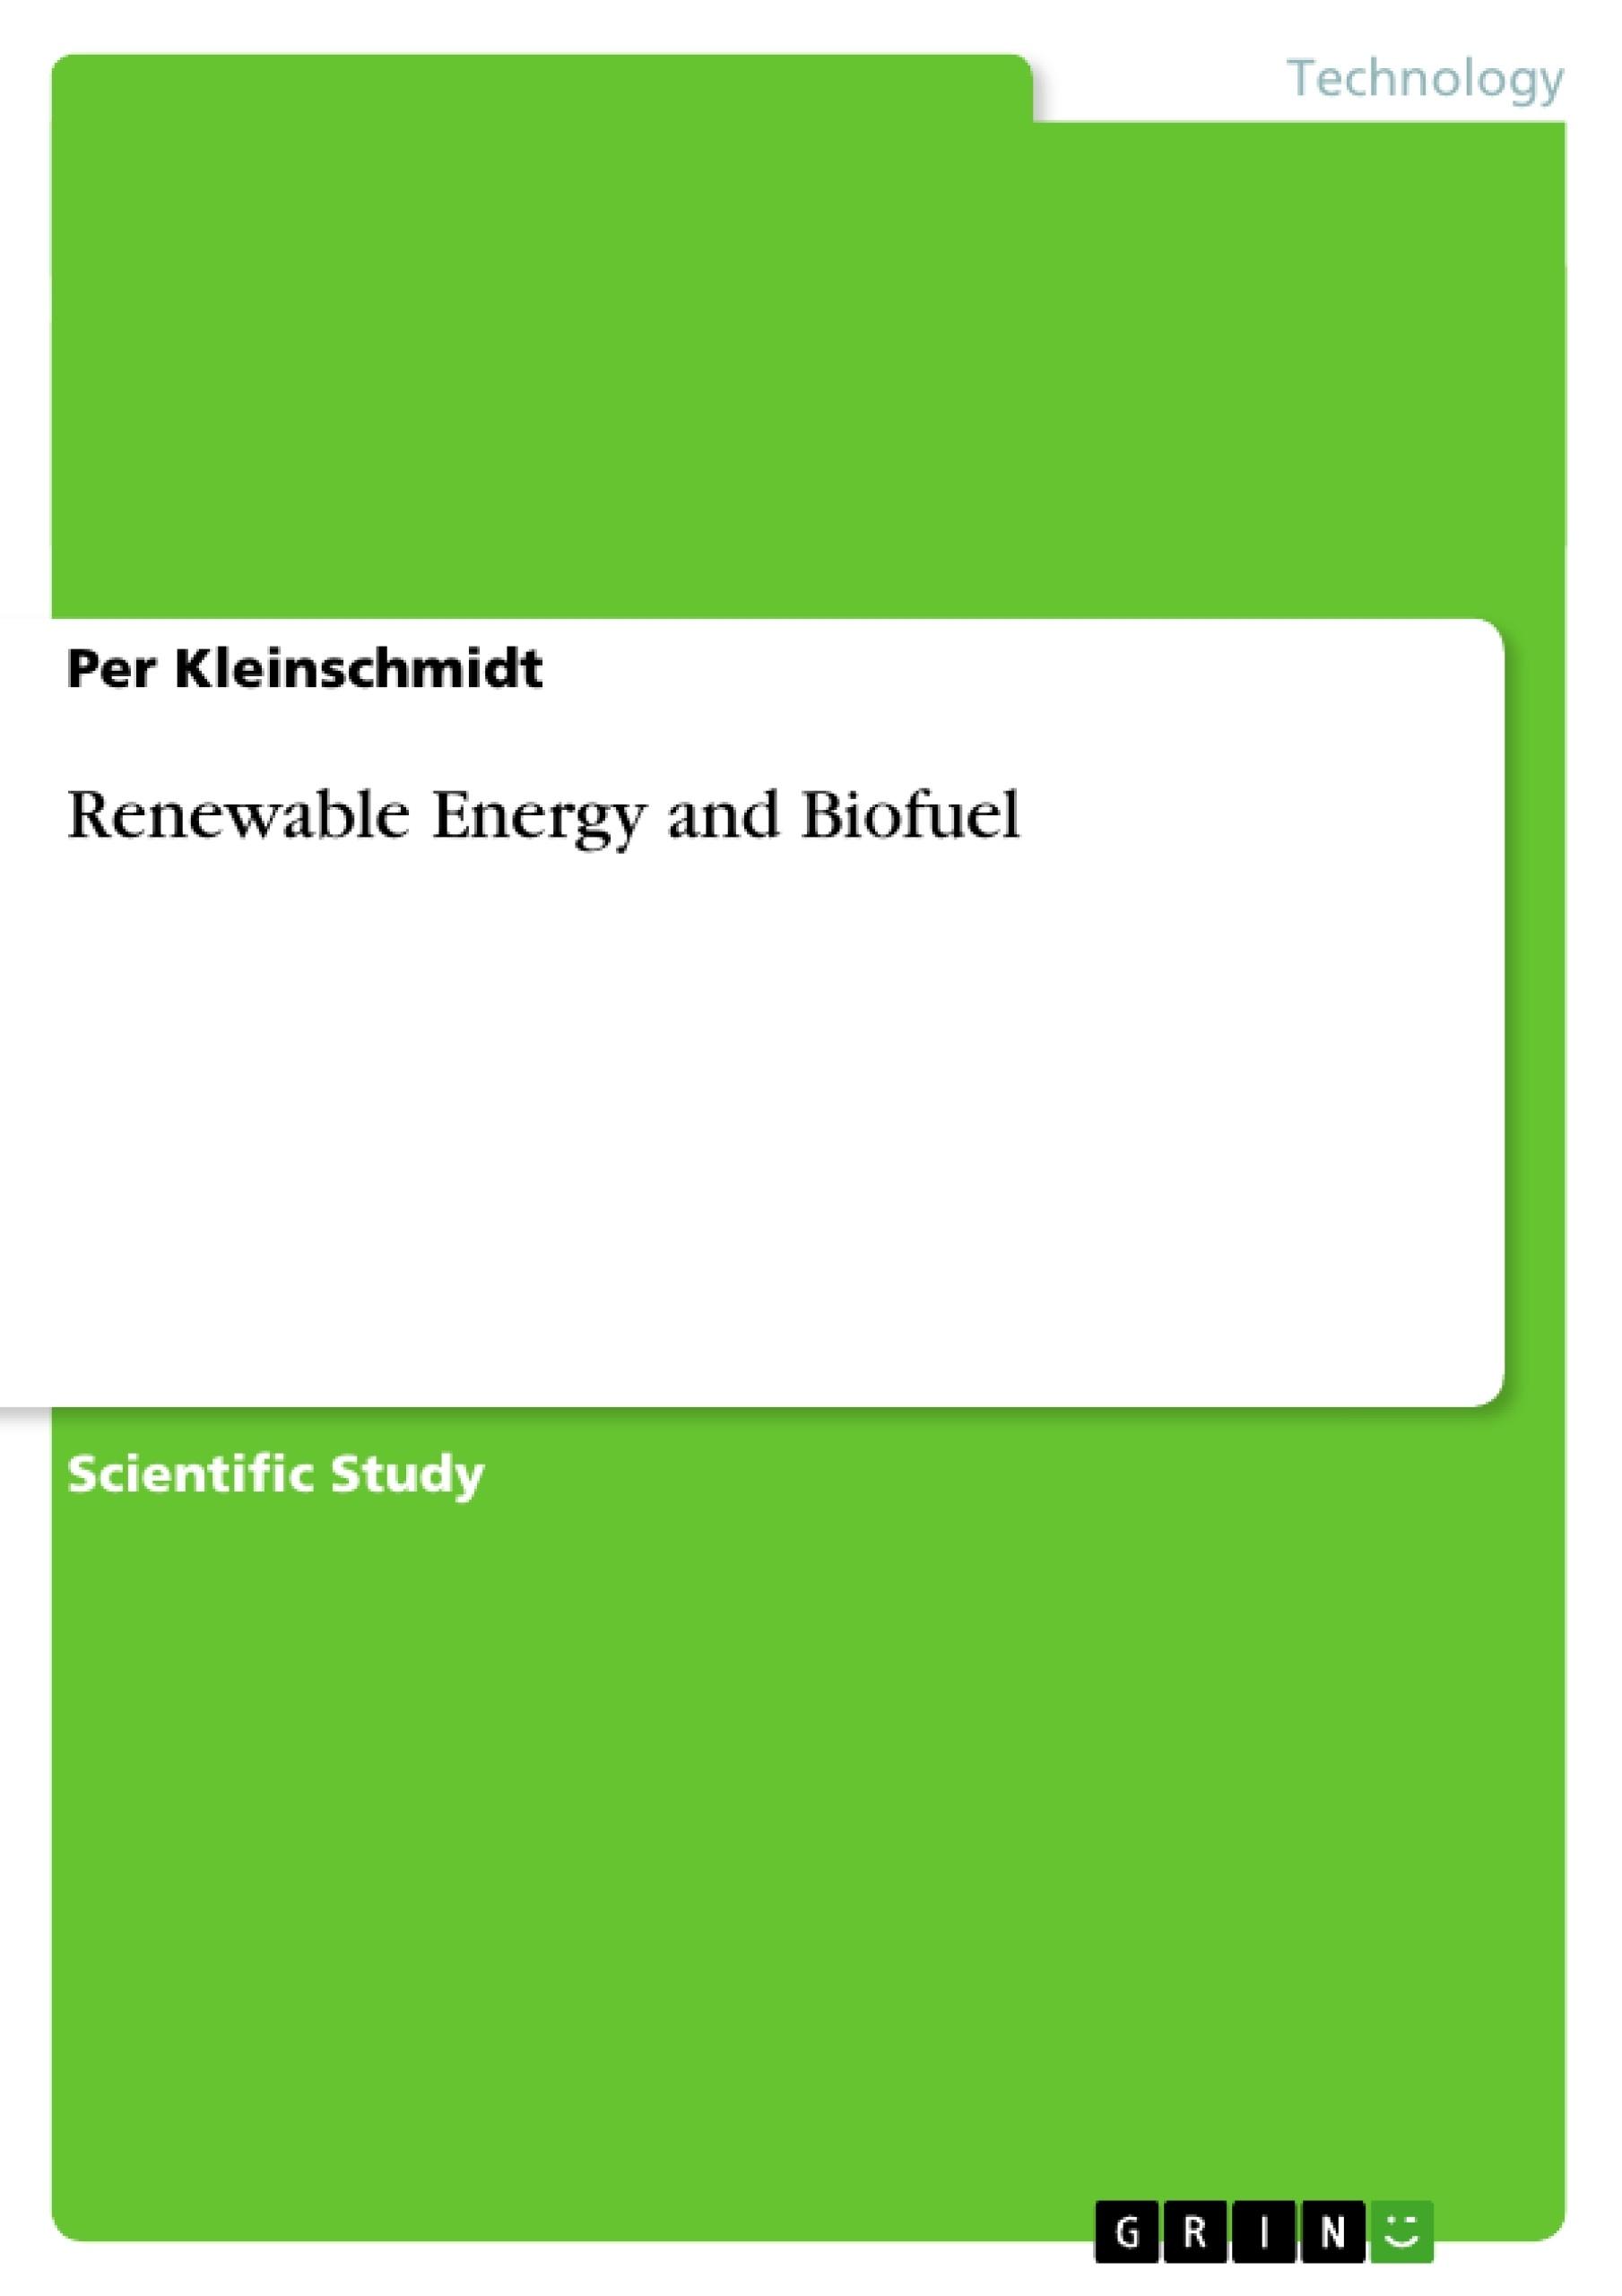 Title: Renewable Energy and Biofuel